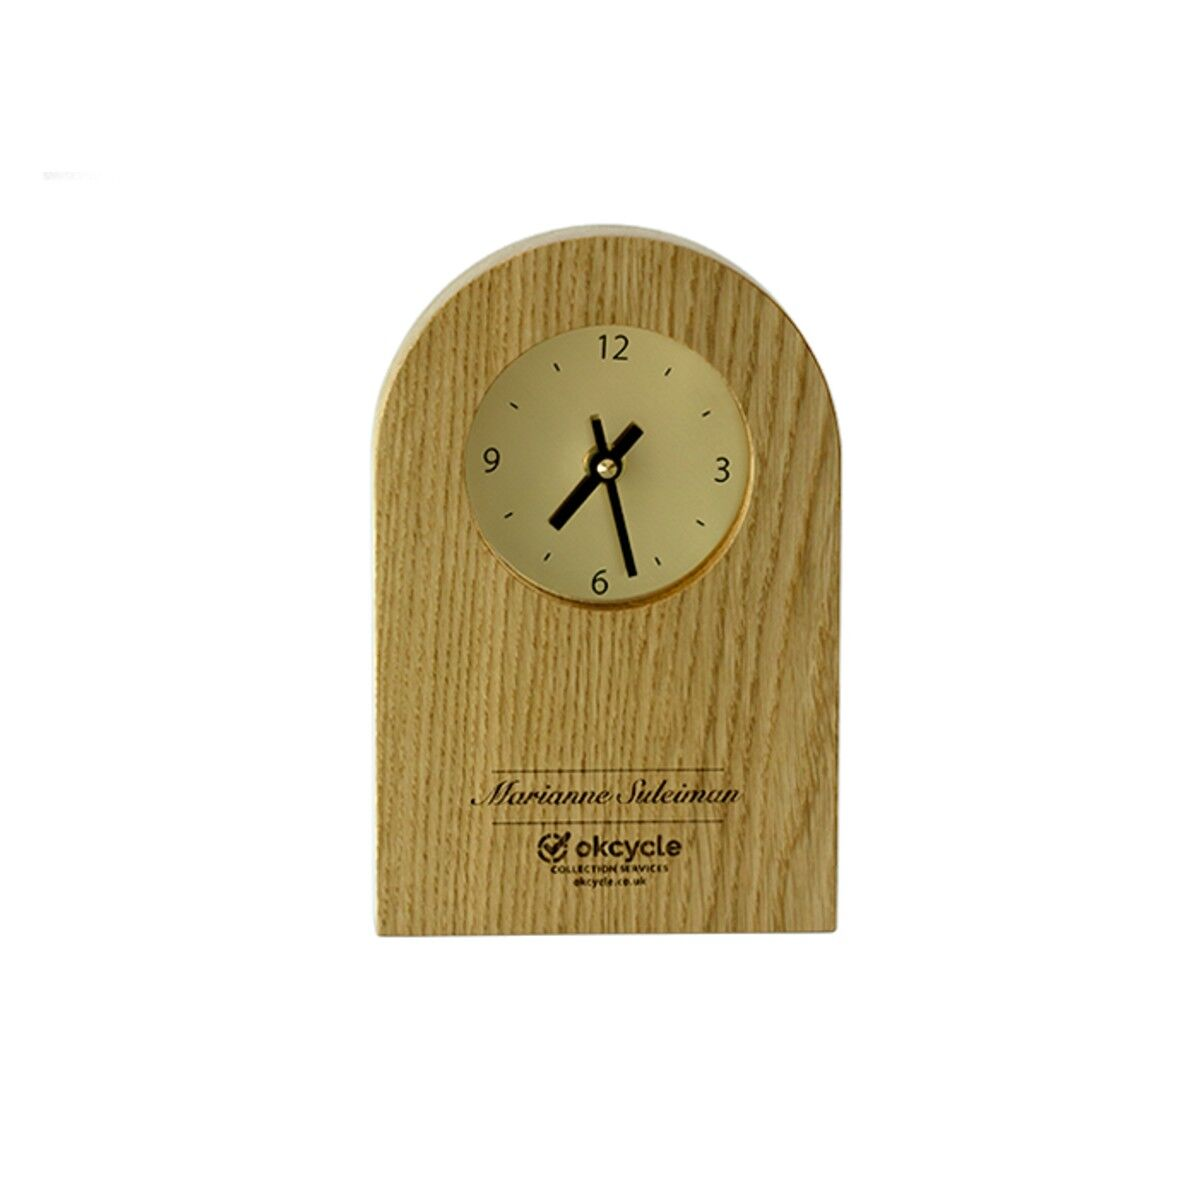 Standard Oak Clocks